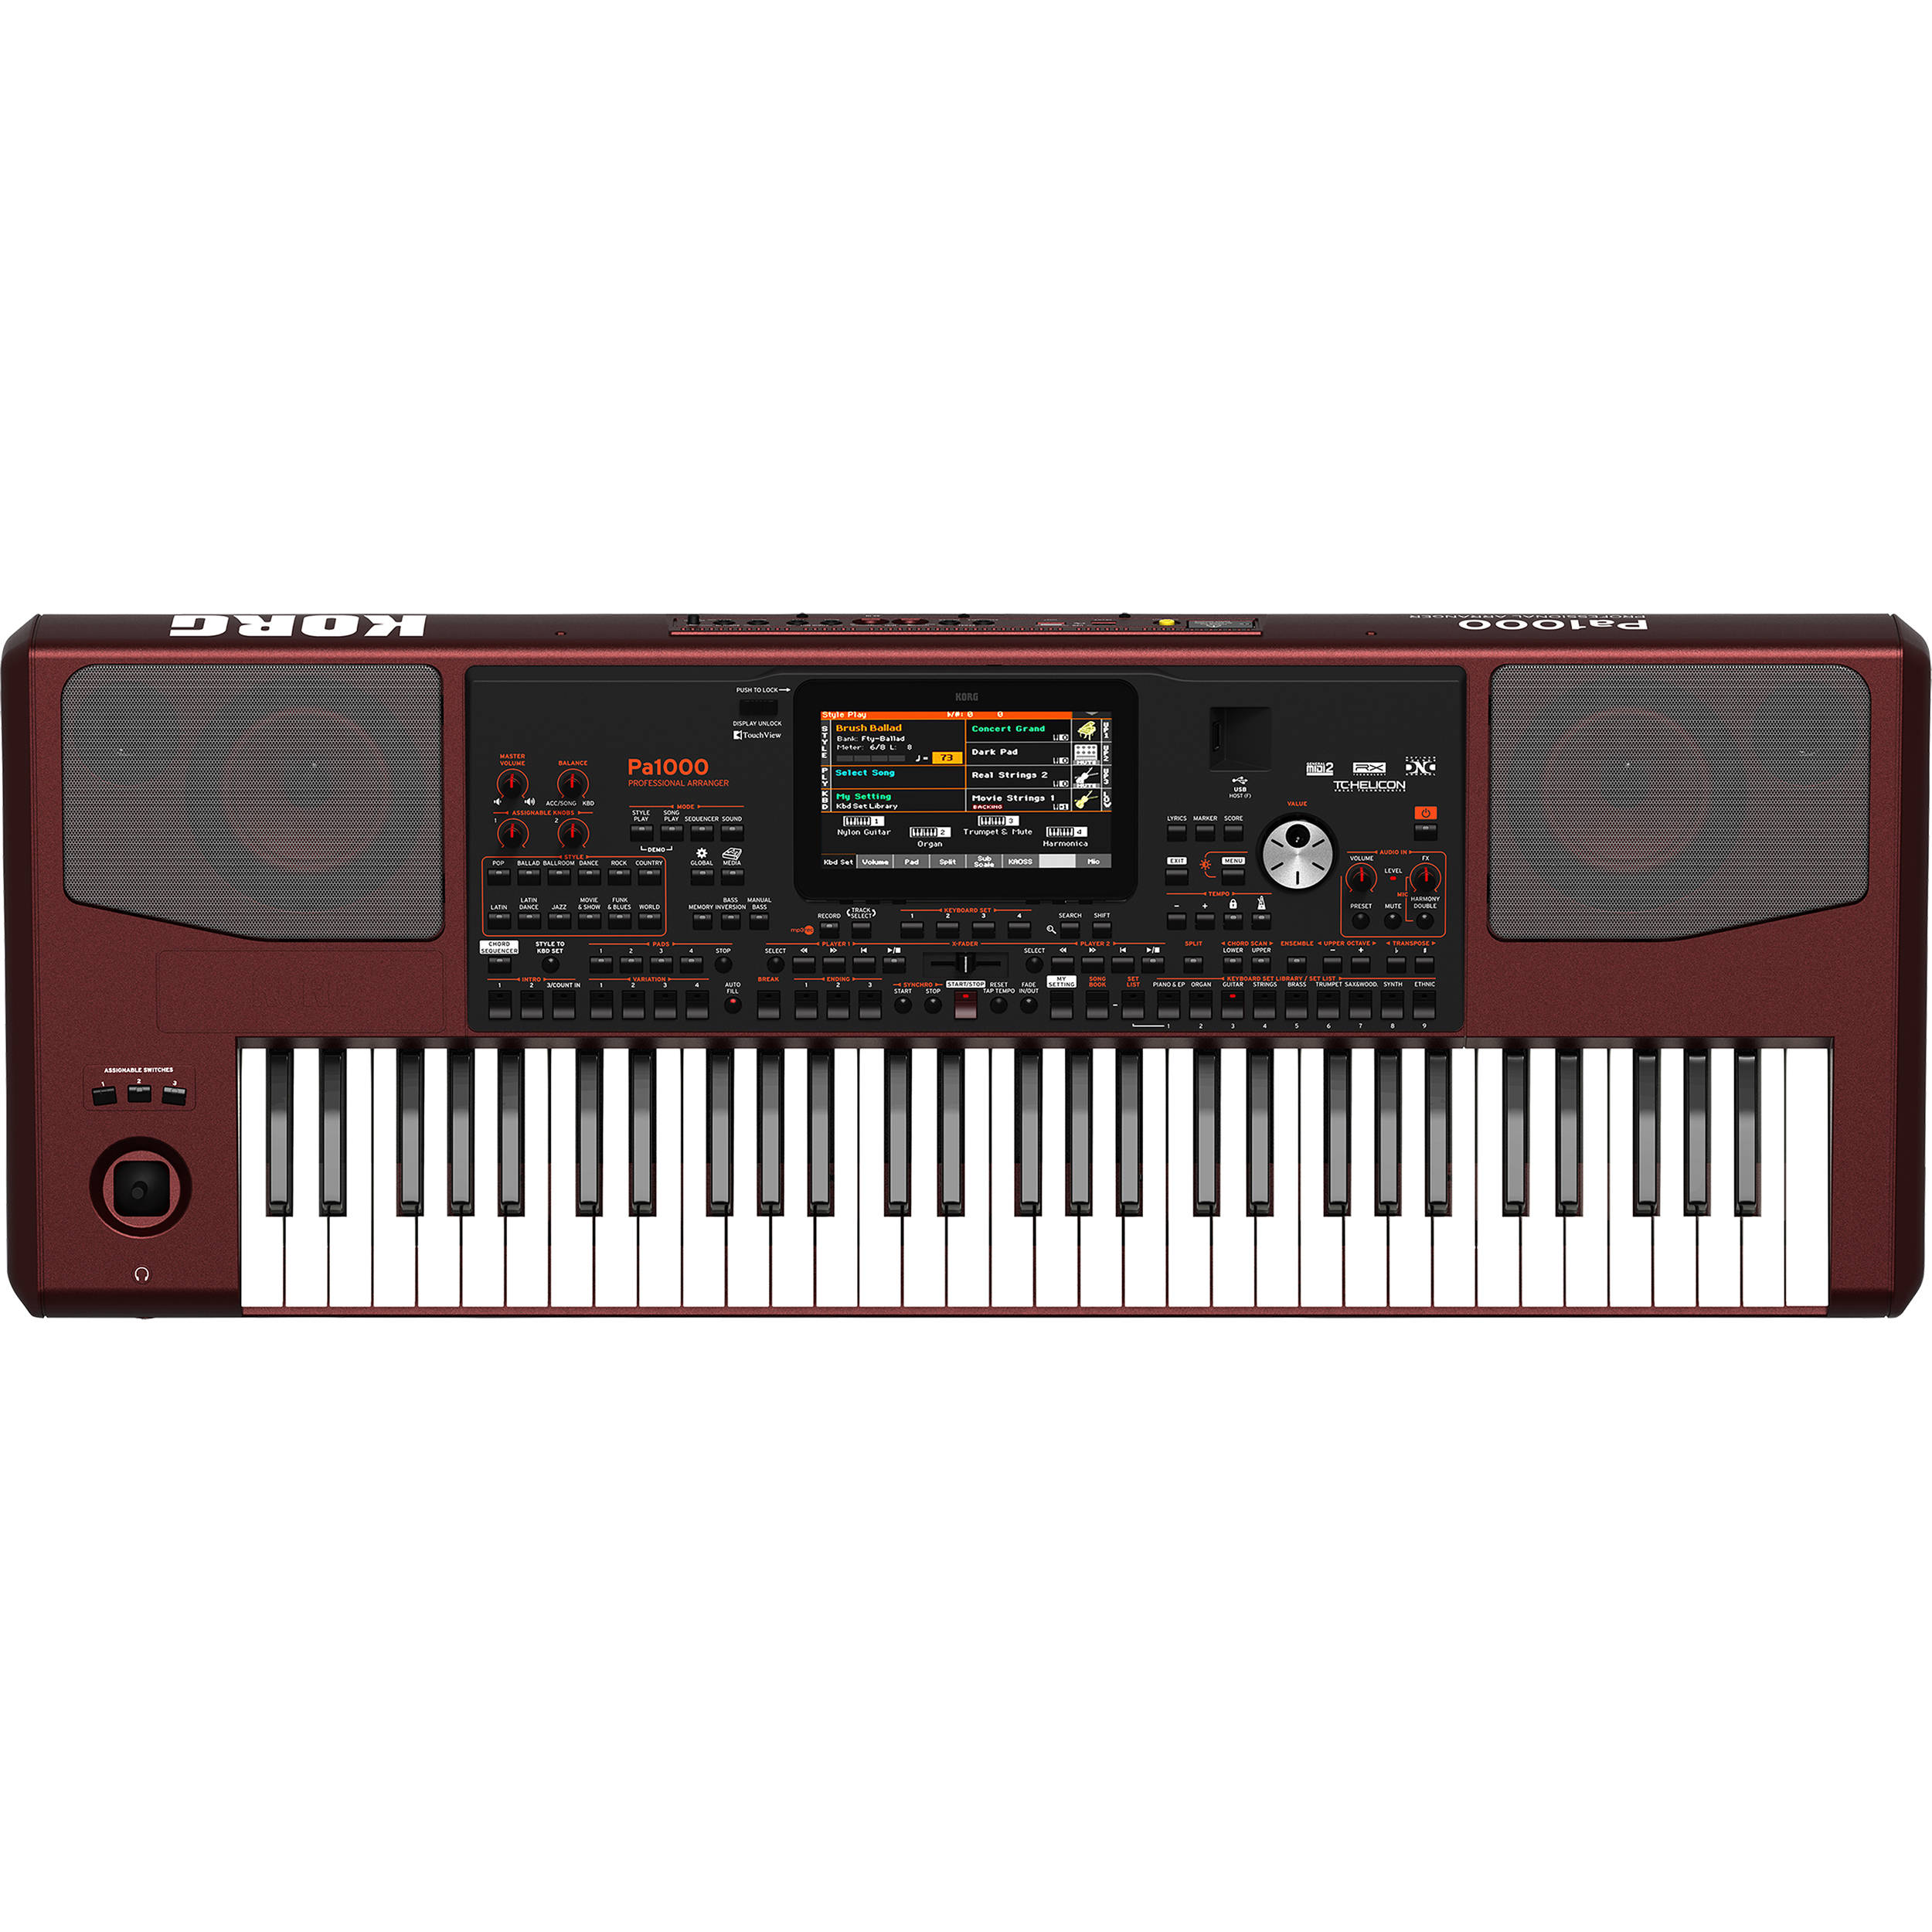 Korg Pa1000 61-Key Pro Arranger with Speakers